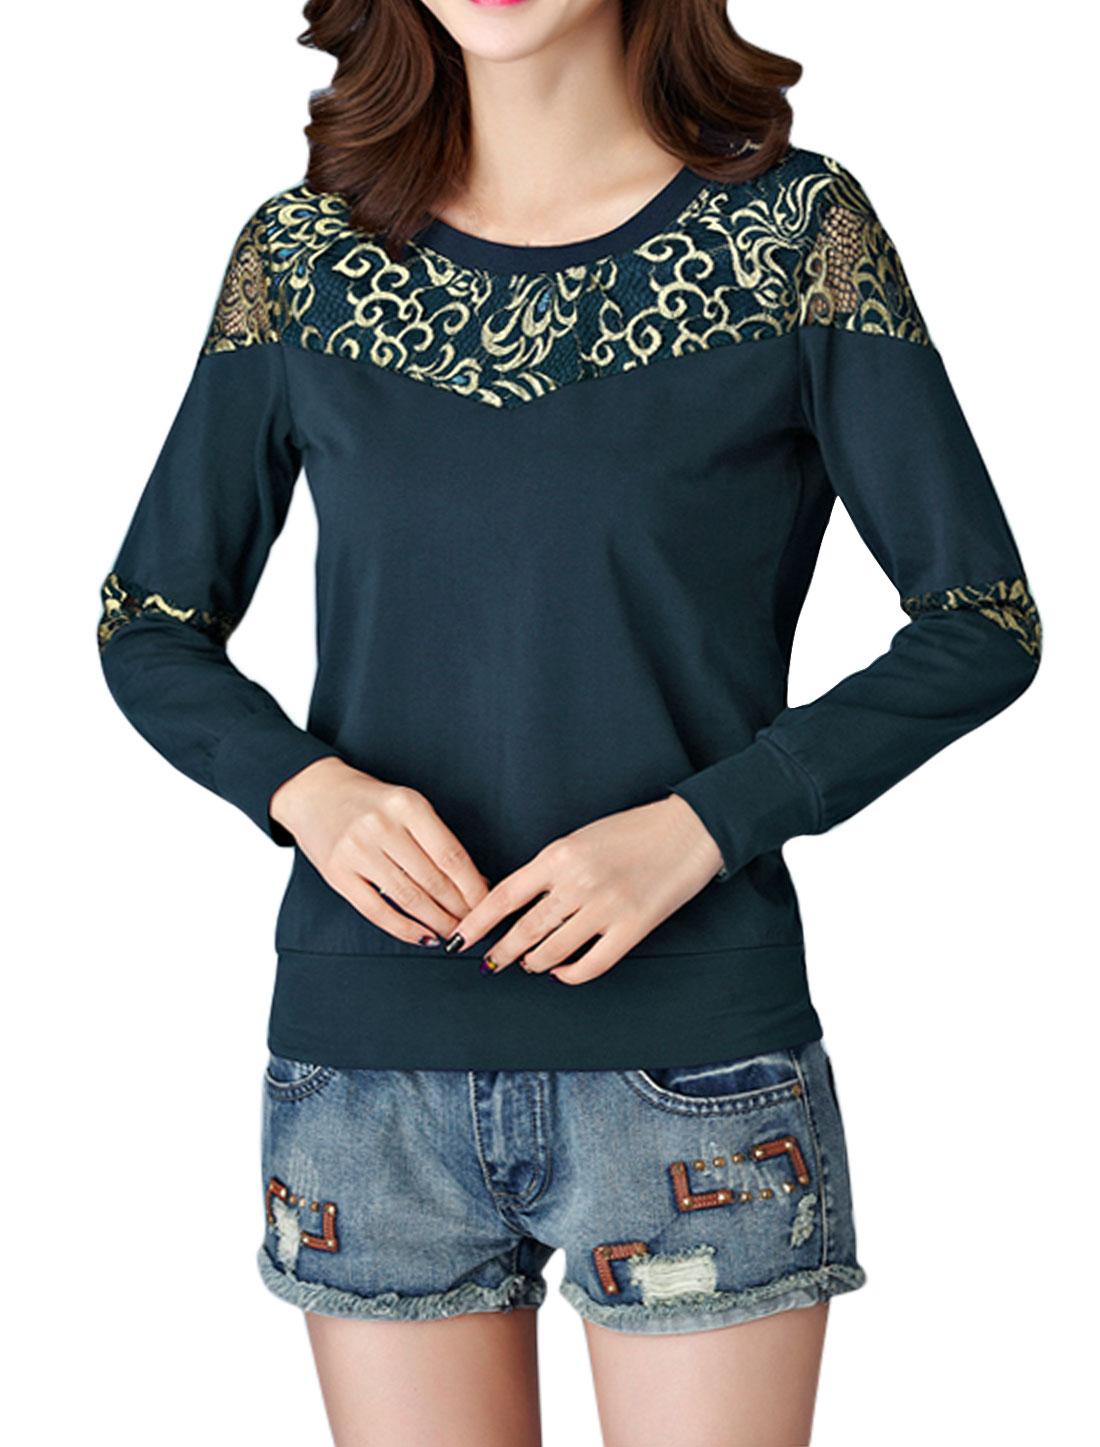 Women Long Sleeves Round Neck Lace Panel Paisleys T-shirt Blue M